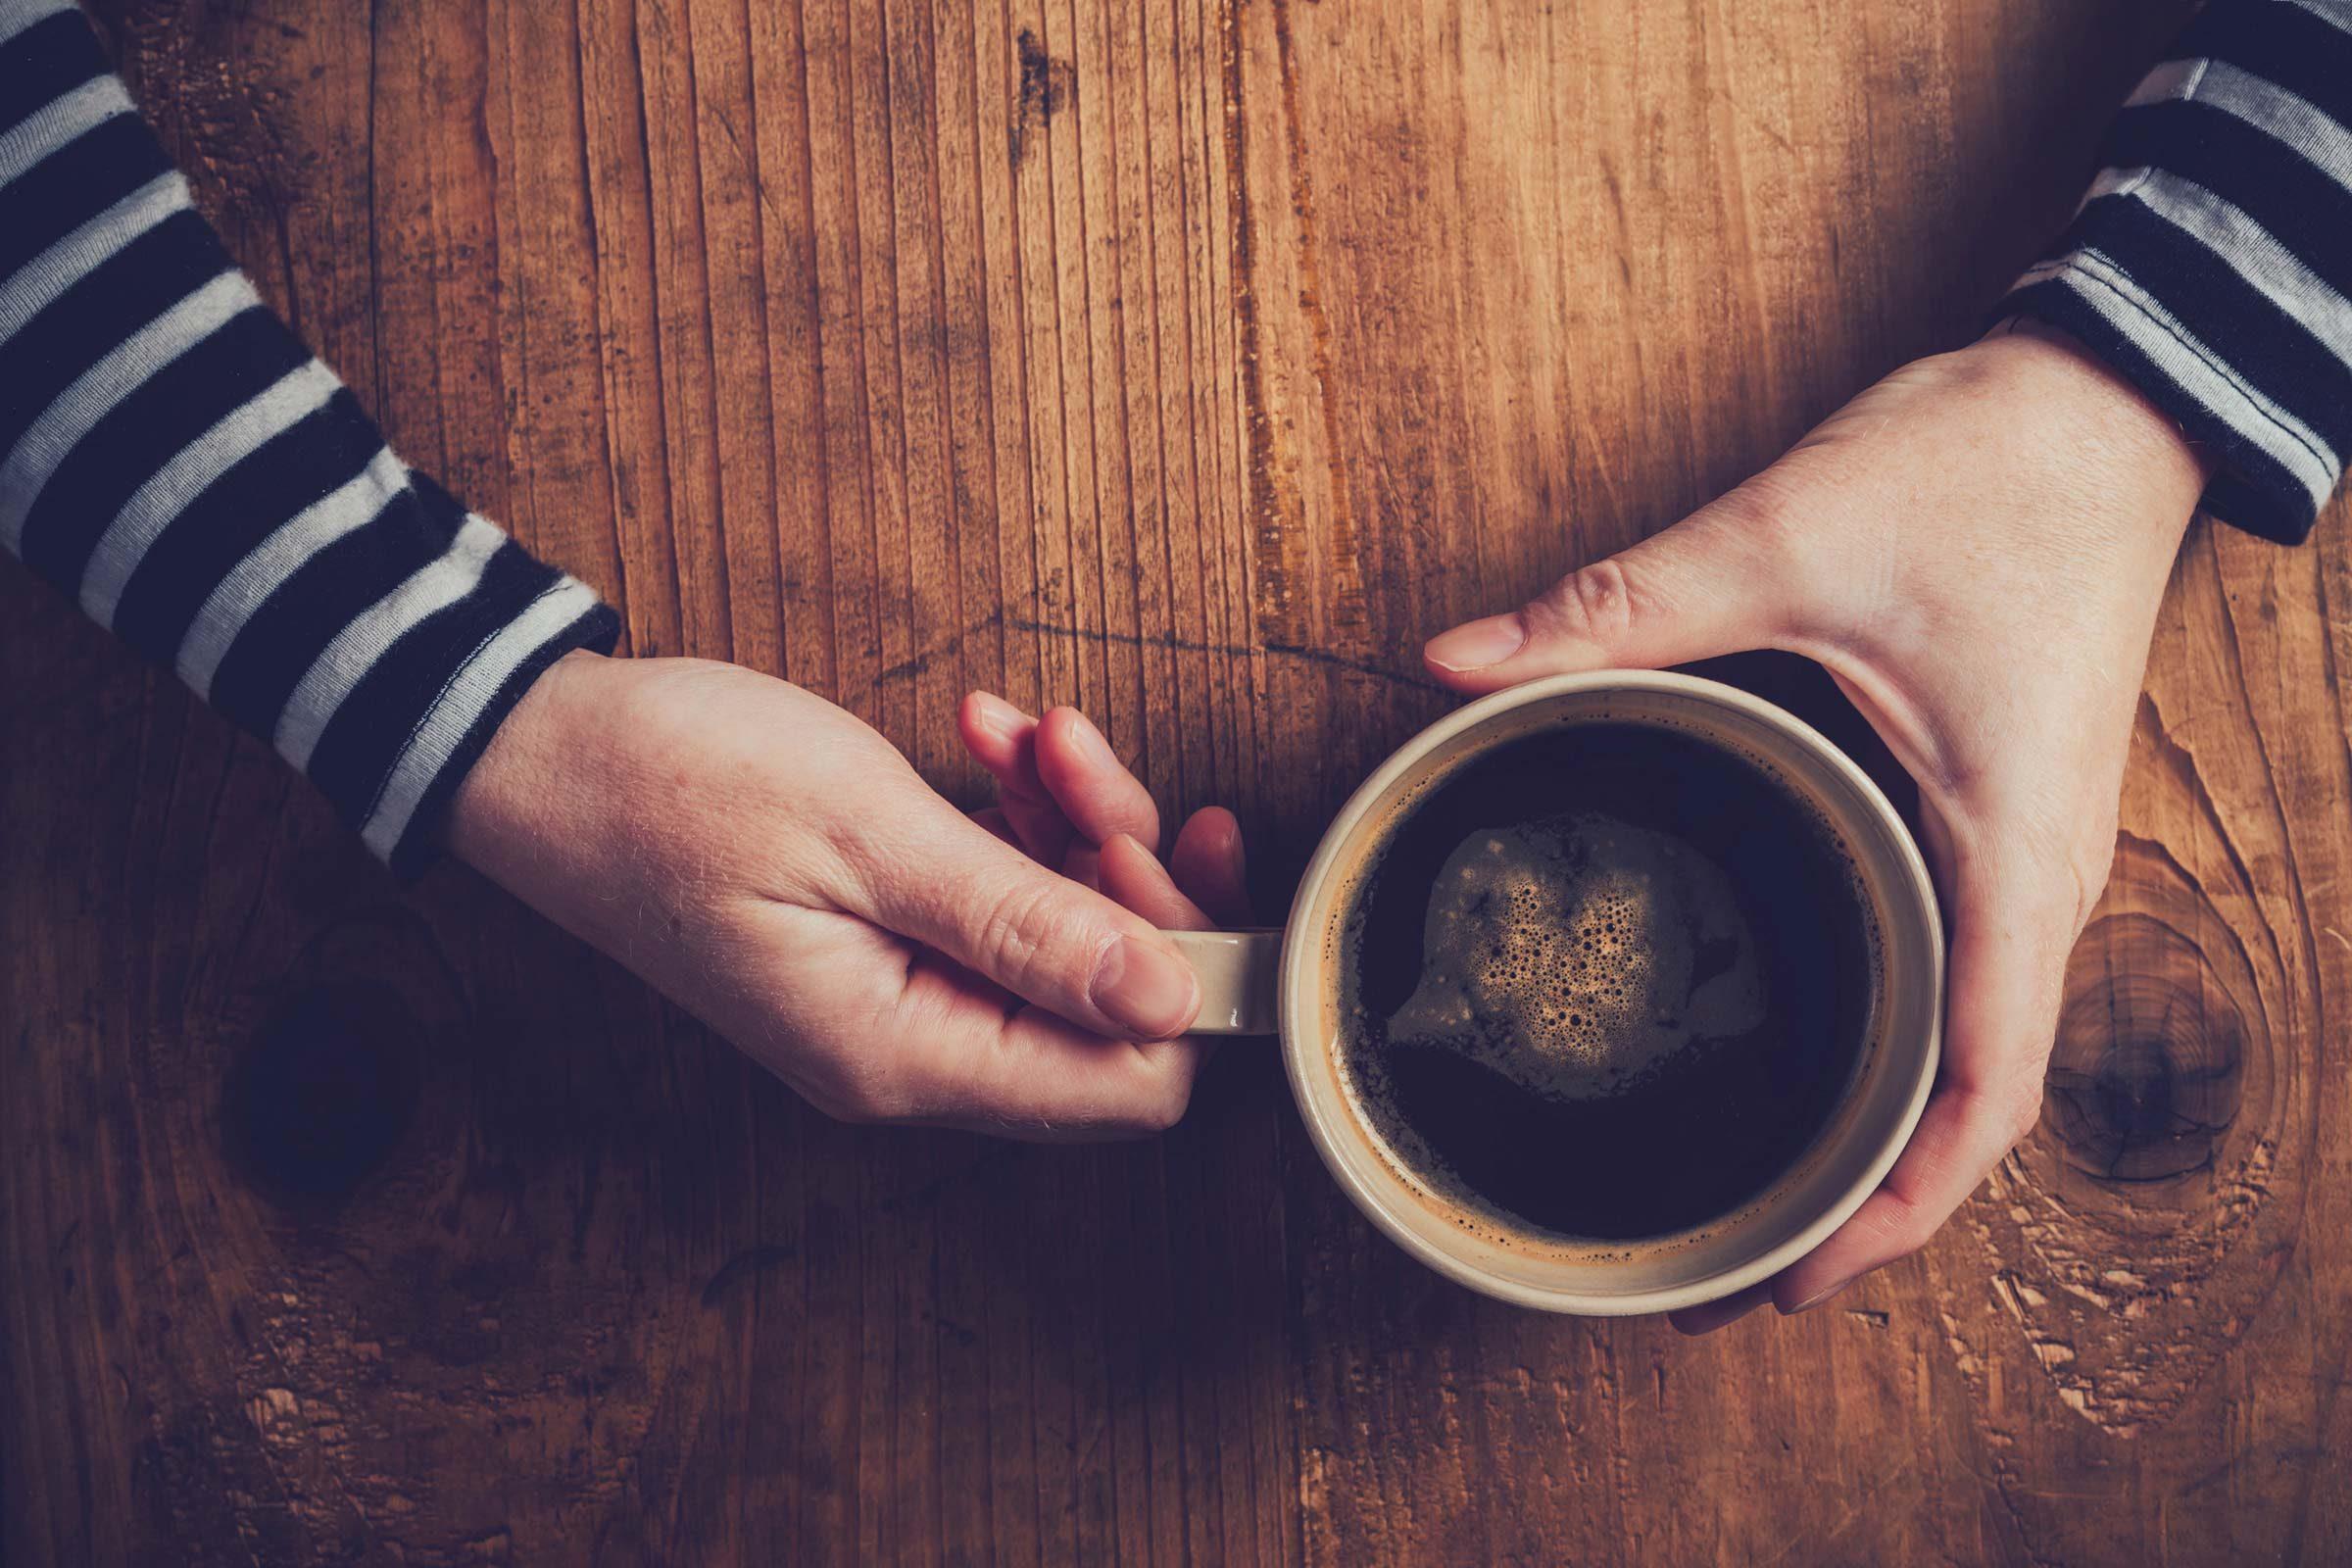 5 Surprising Factors That Affect How Fertile You Are